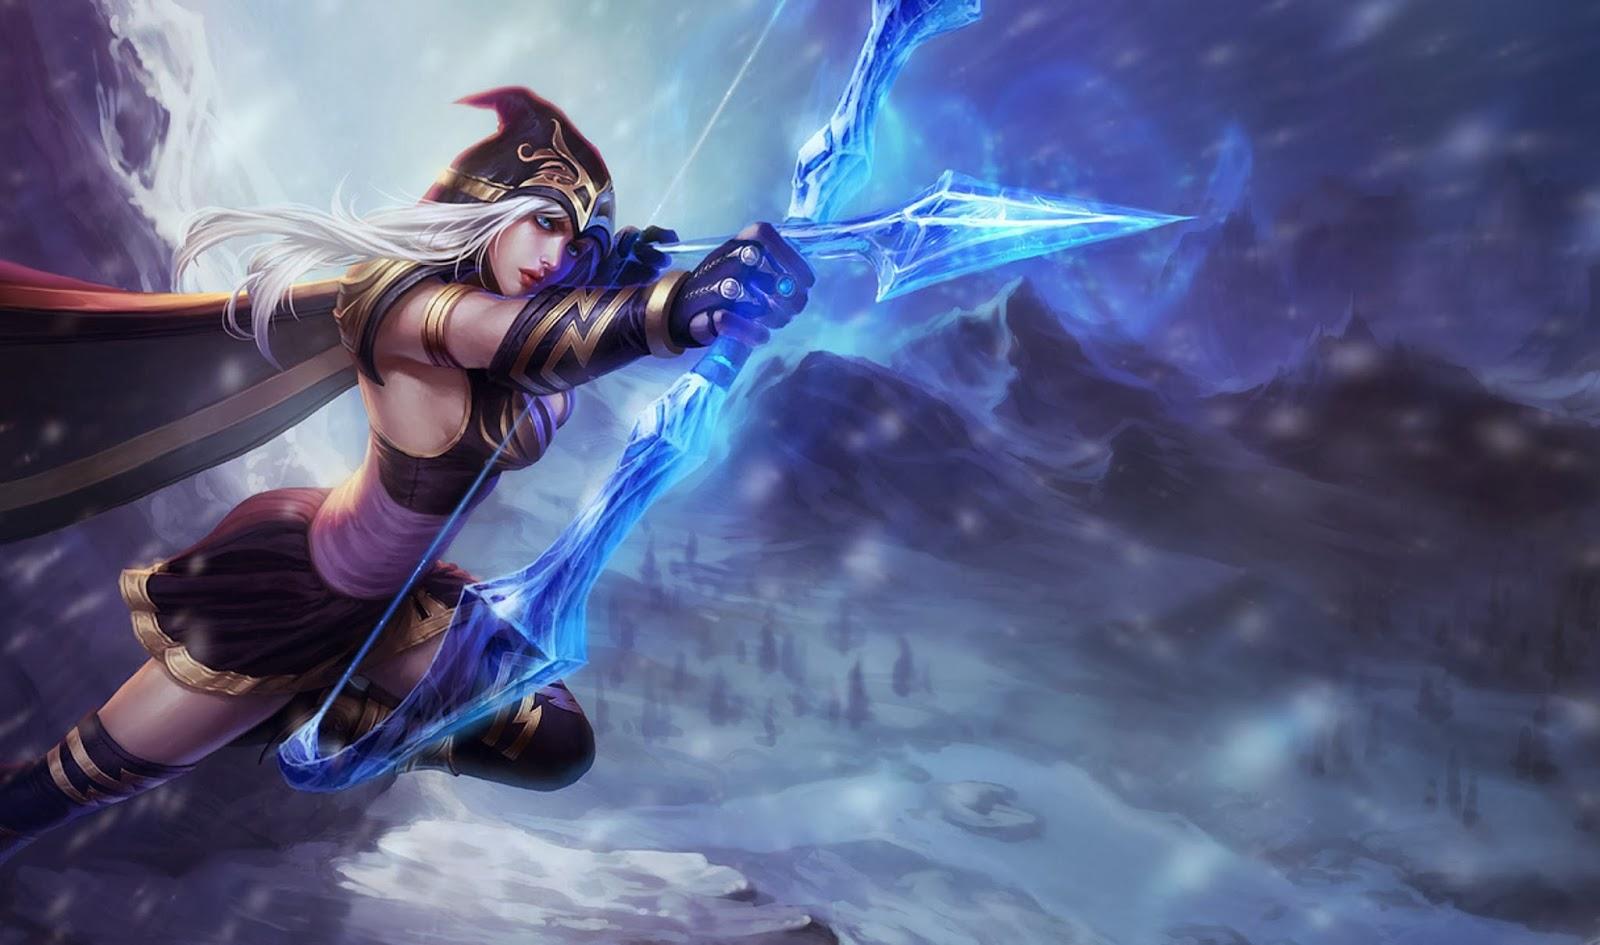 League Of Legends Girls Hero Hd Wallpaper Mobile Wallpapers